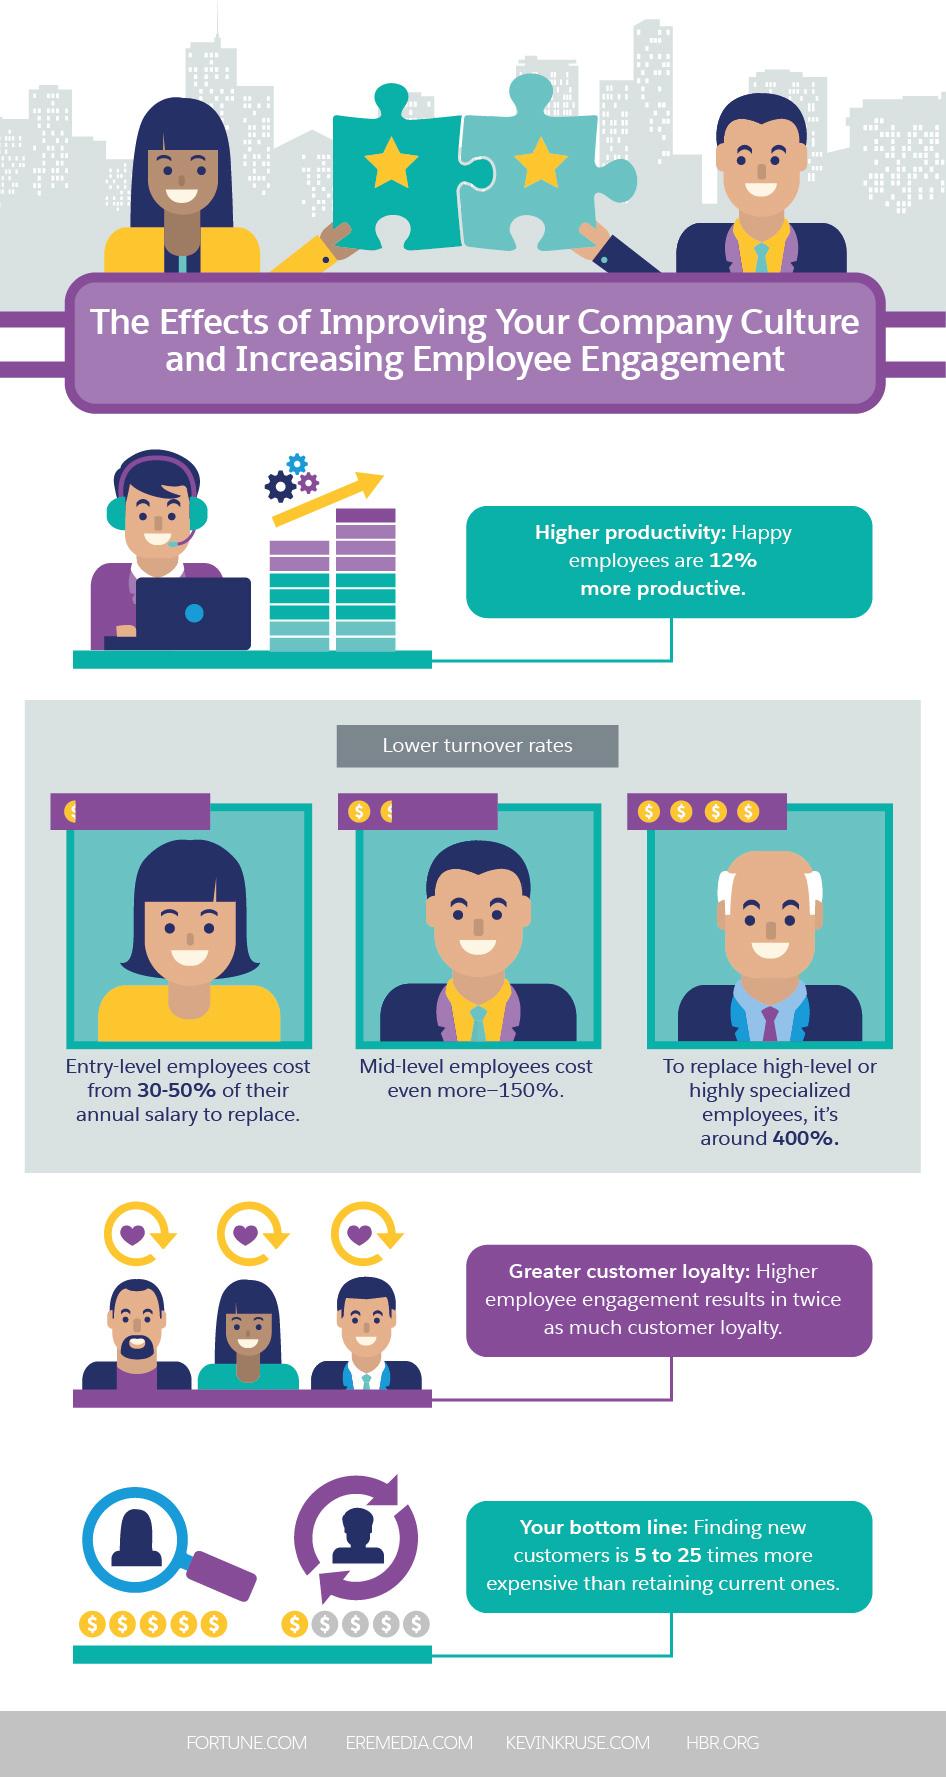 1. Strengthen your customer service skills